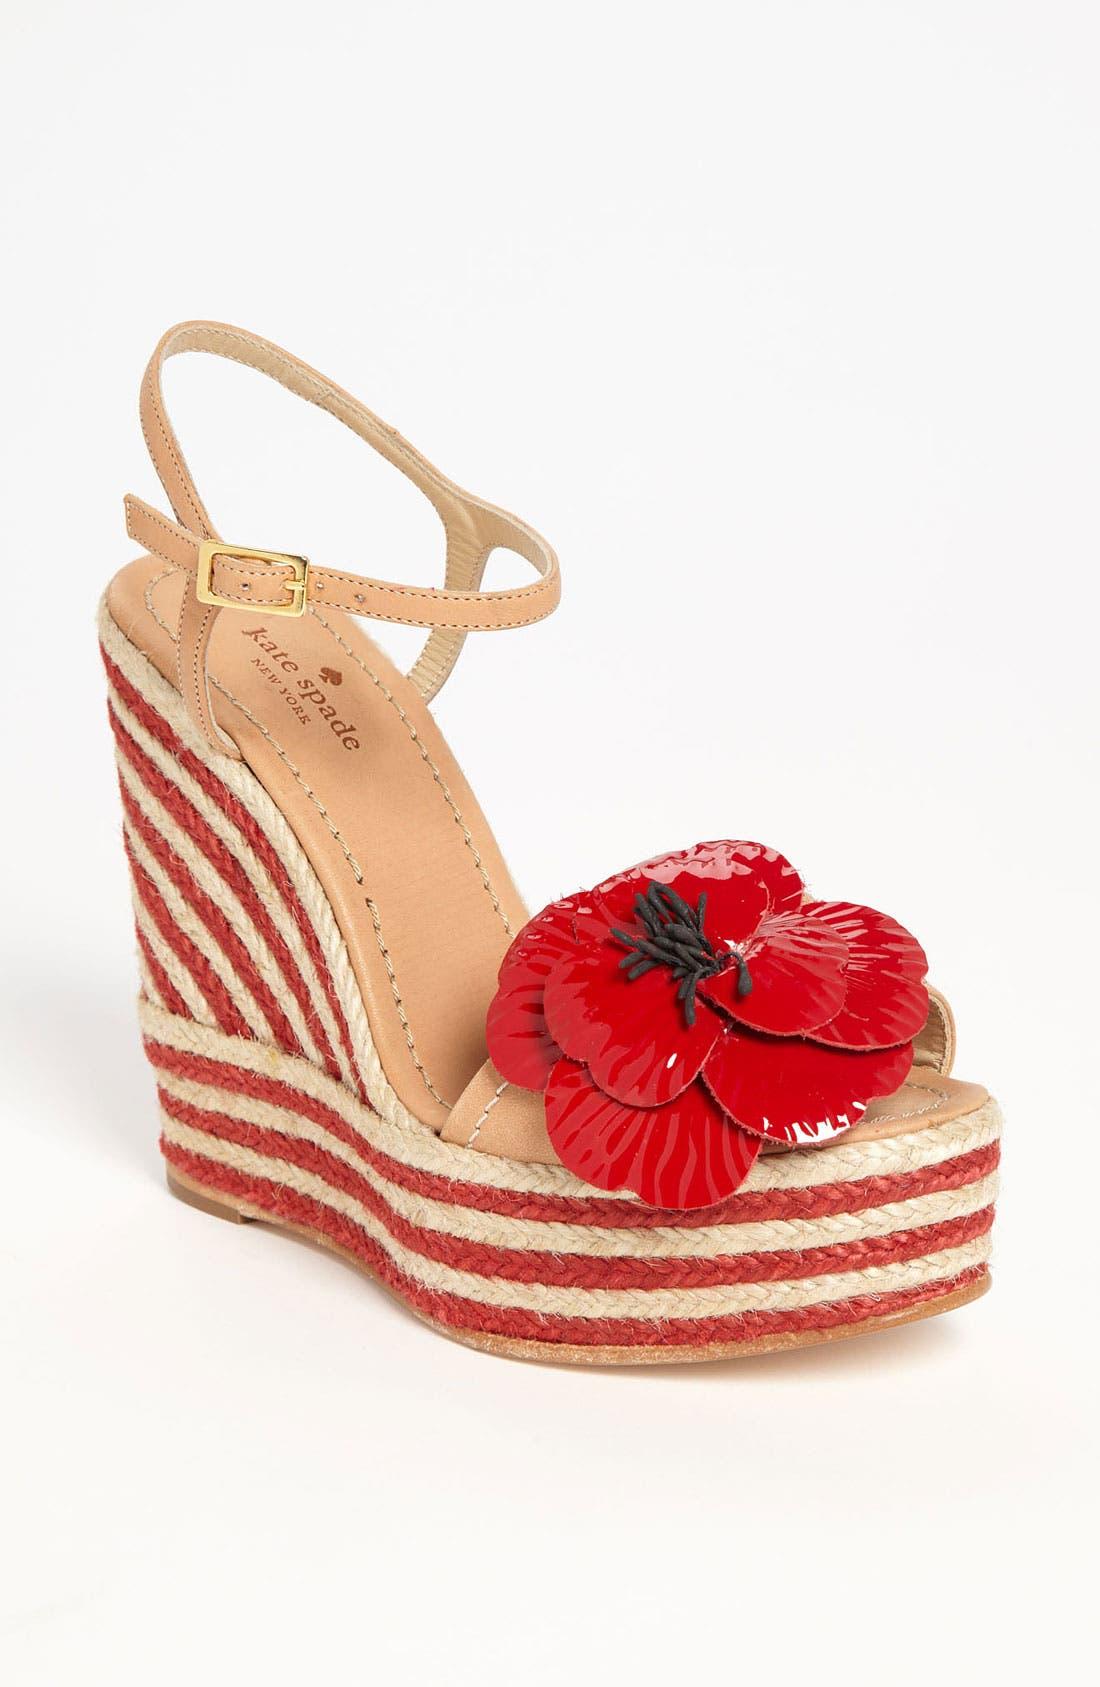 Alternate Image 1 Selected - kate spade new york 'lainey' wedge sandal